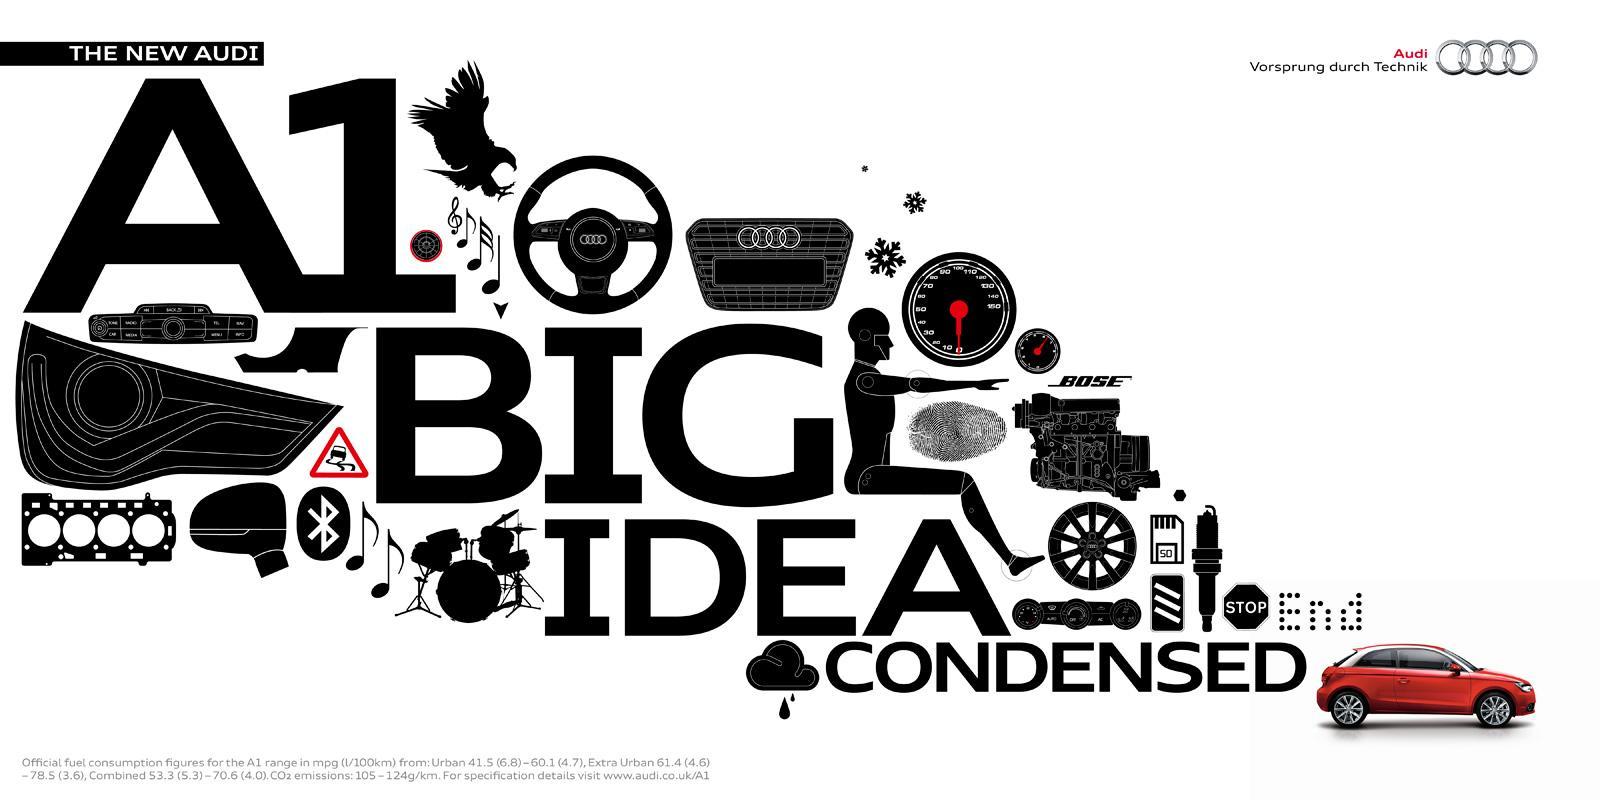 Audi Print Ad -  The big idea condensed, Master